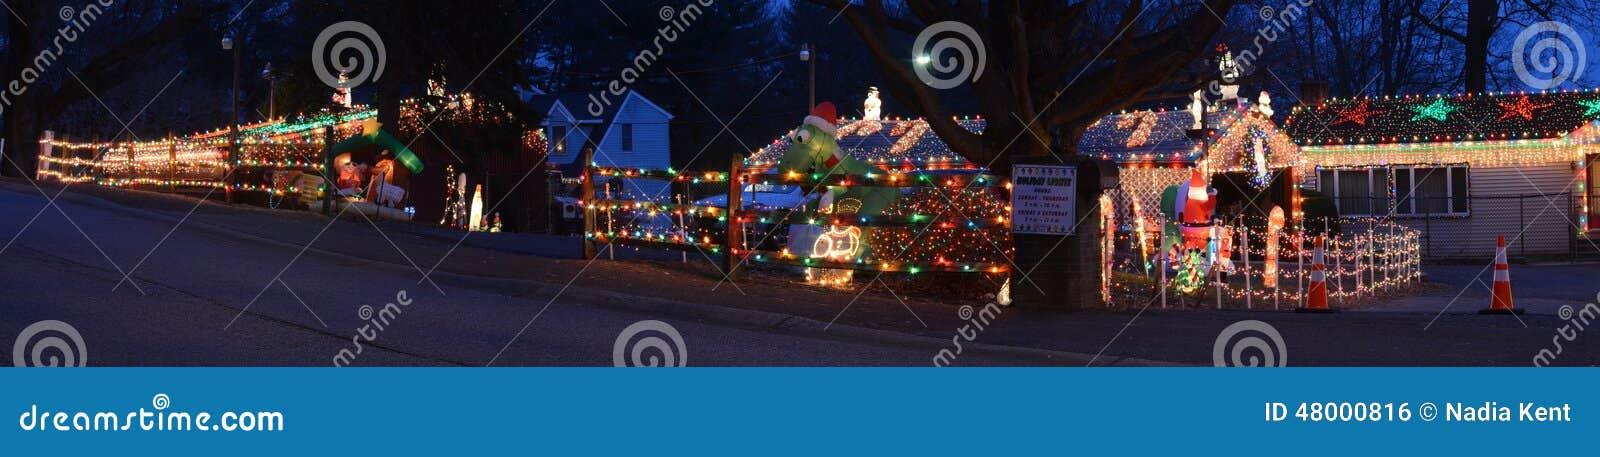 Christmas Lights Wonderful Fantasy